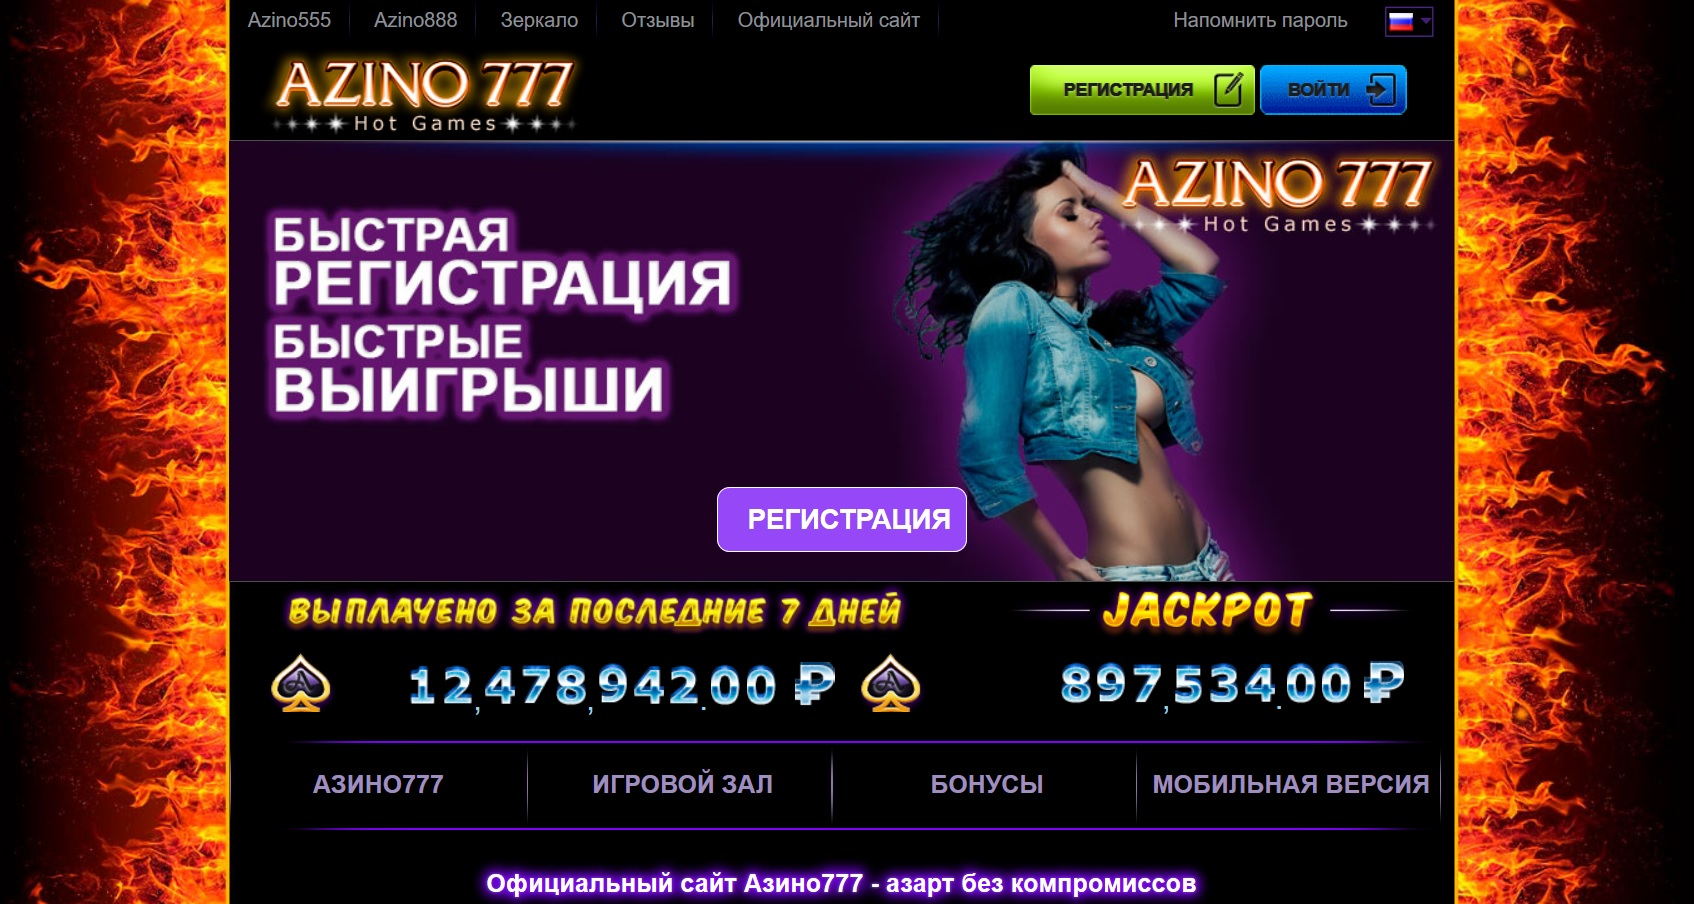 азино777 контакты